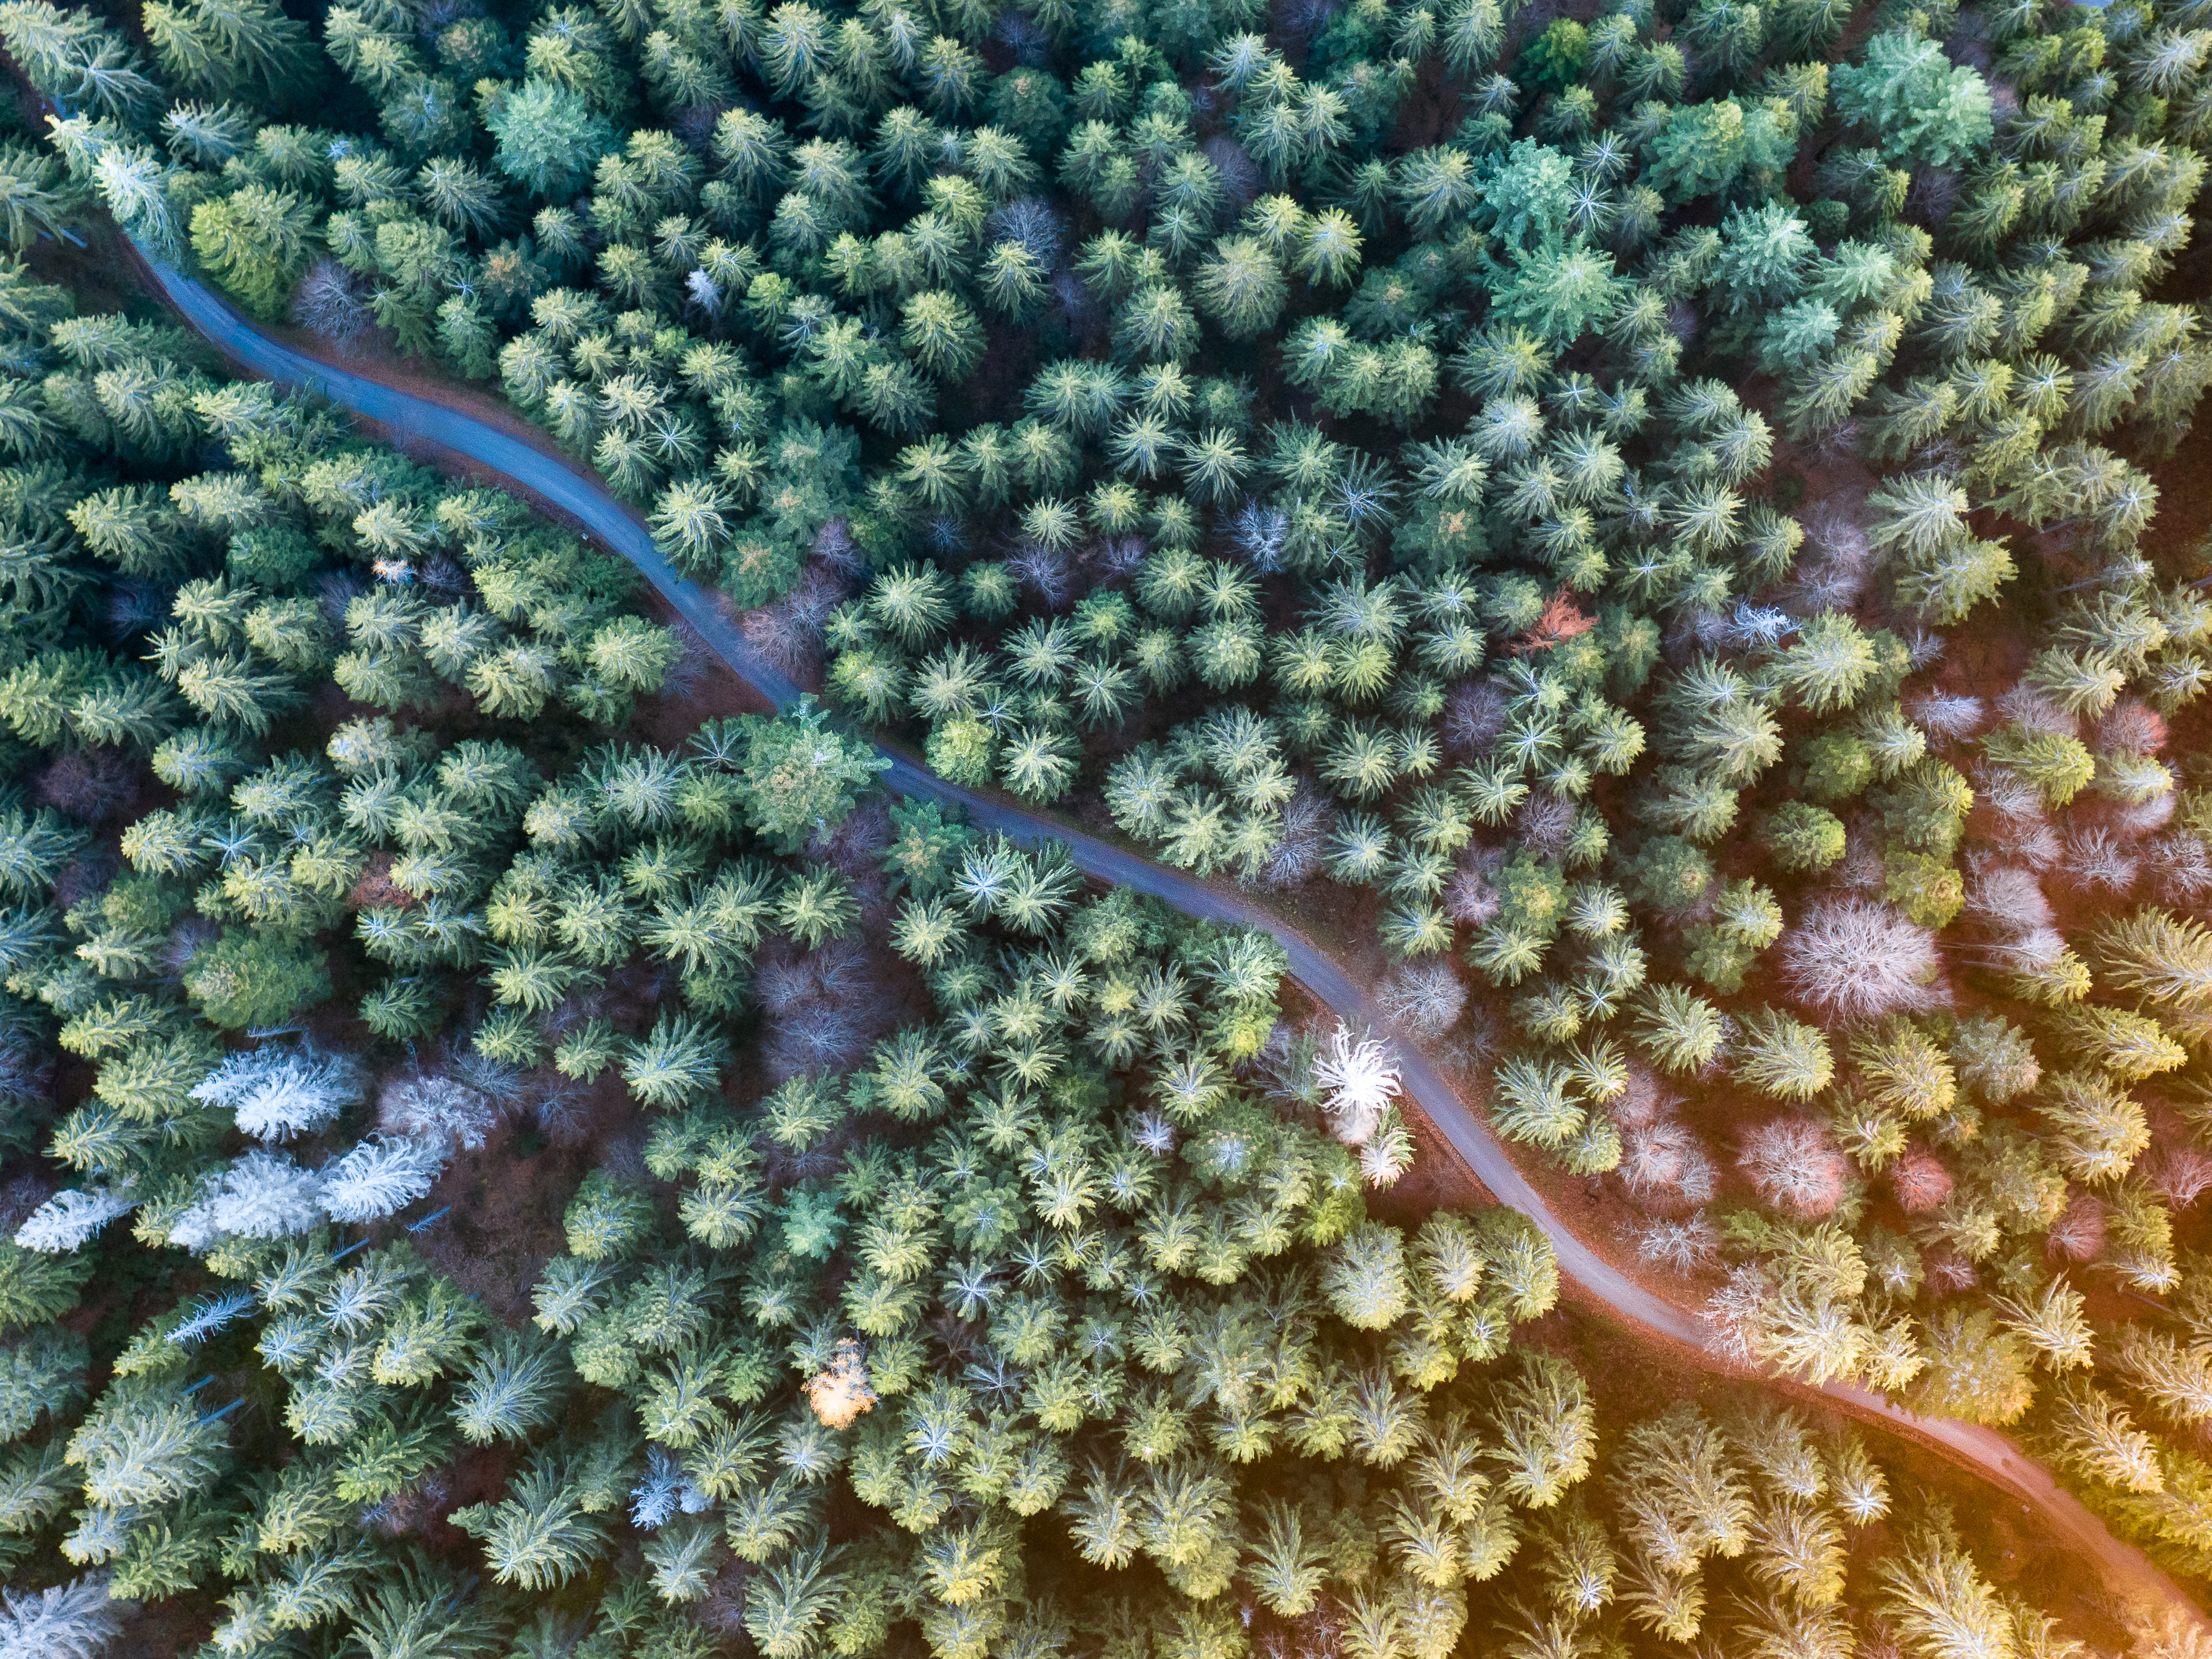 Black Forest Vertical Drone Shot